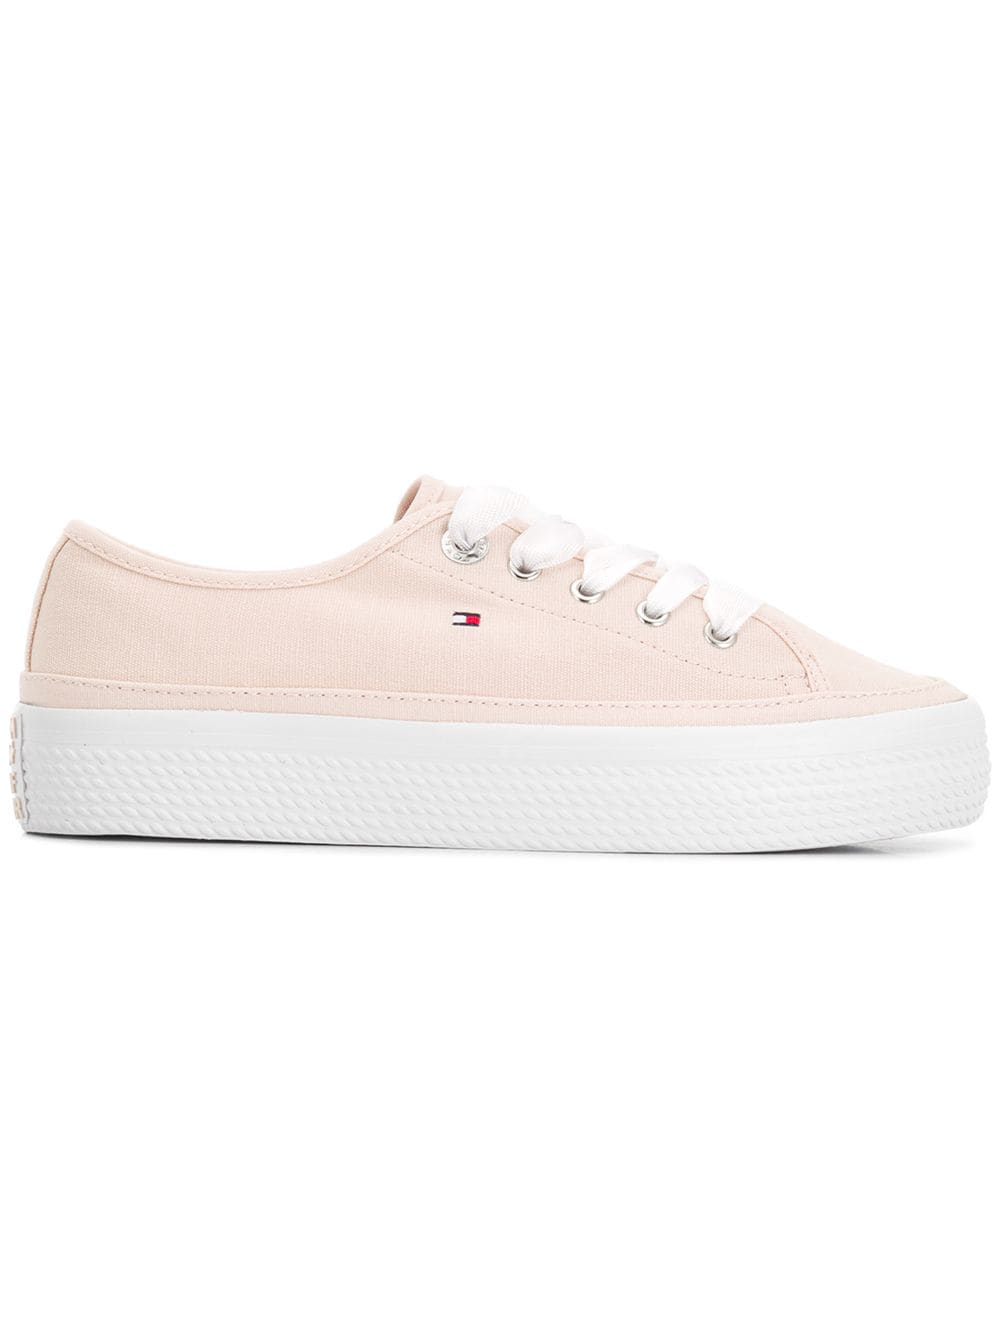 a3b91380 Tommy Hilfiger Platform Trainers - Pink | ModeSens